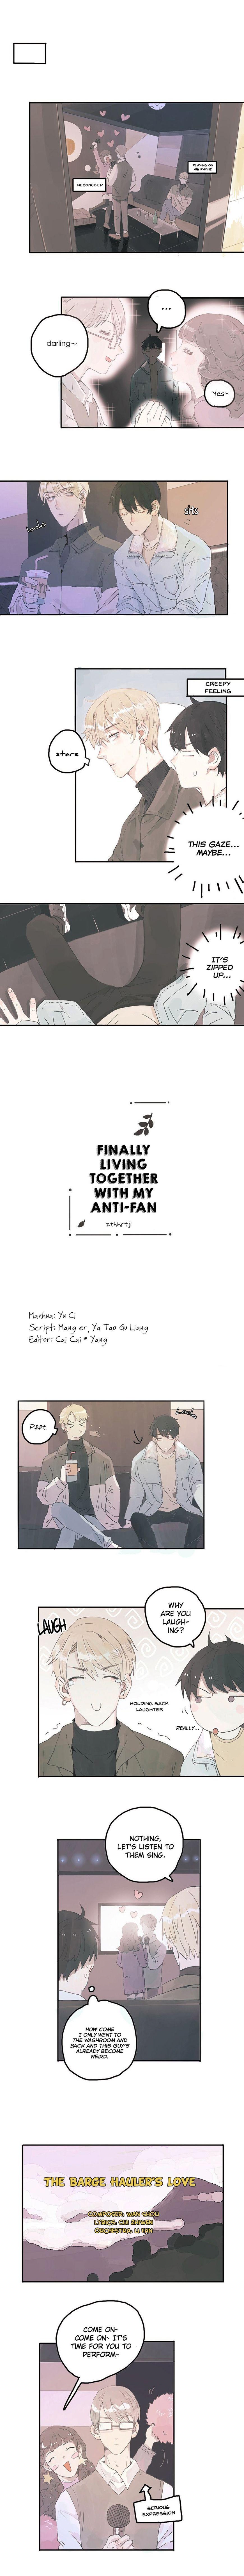 https://im.nineanime.com/comics/pic9/28/20572/413382/fe0437935a8eb2c42ac327ae401d8482.jpg Page 1